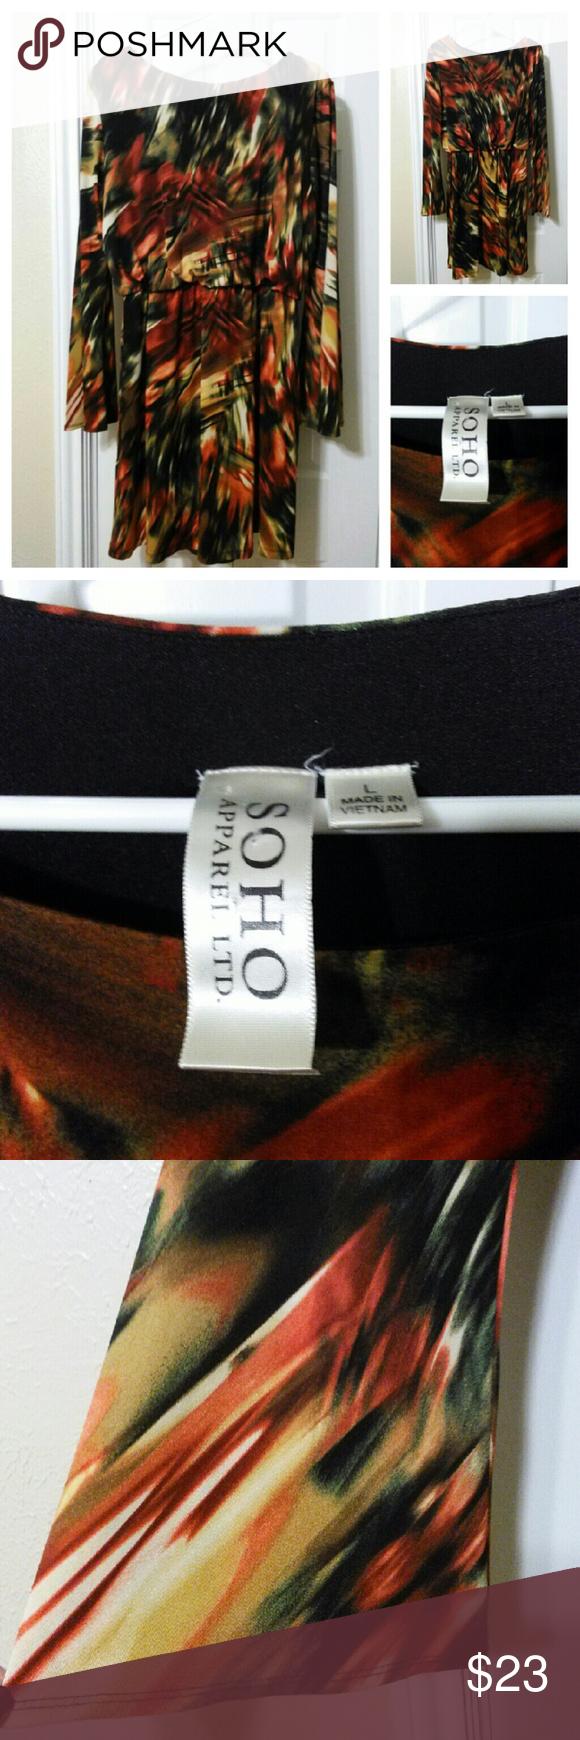 Soho Apparel LTD Dresses